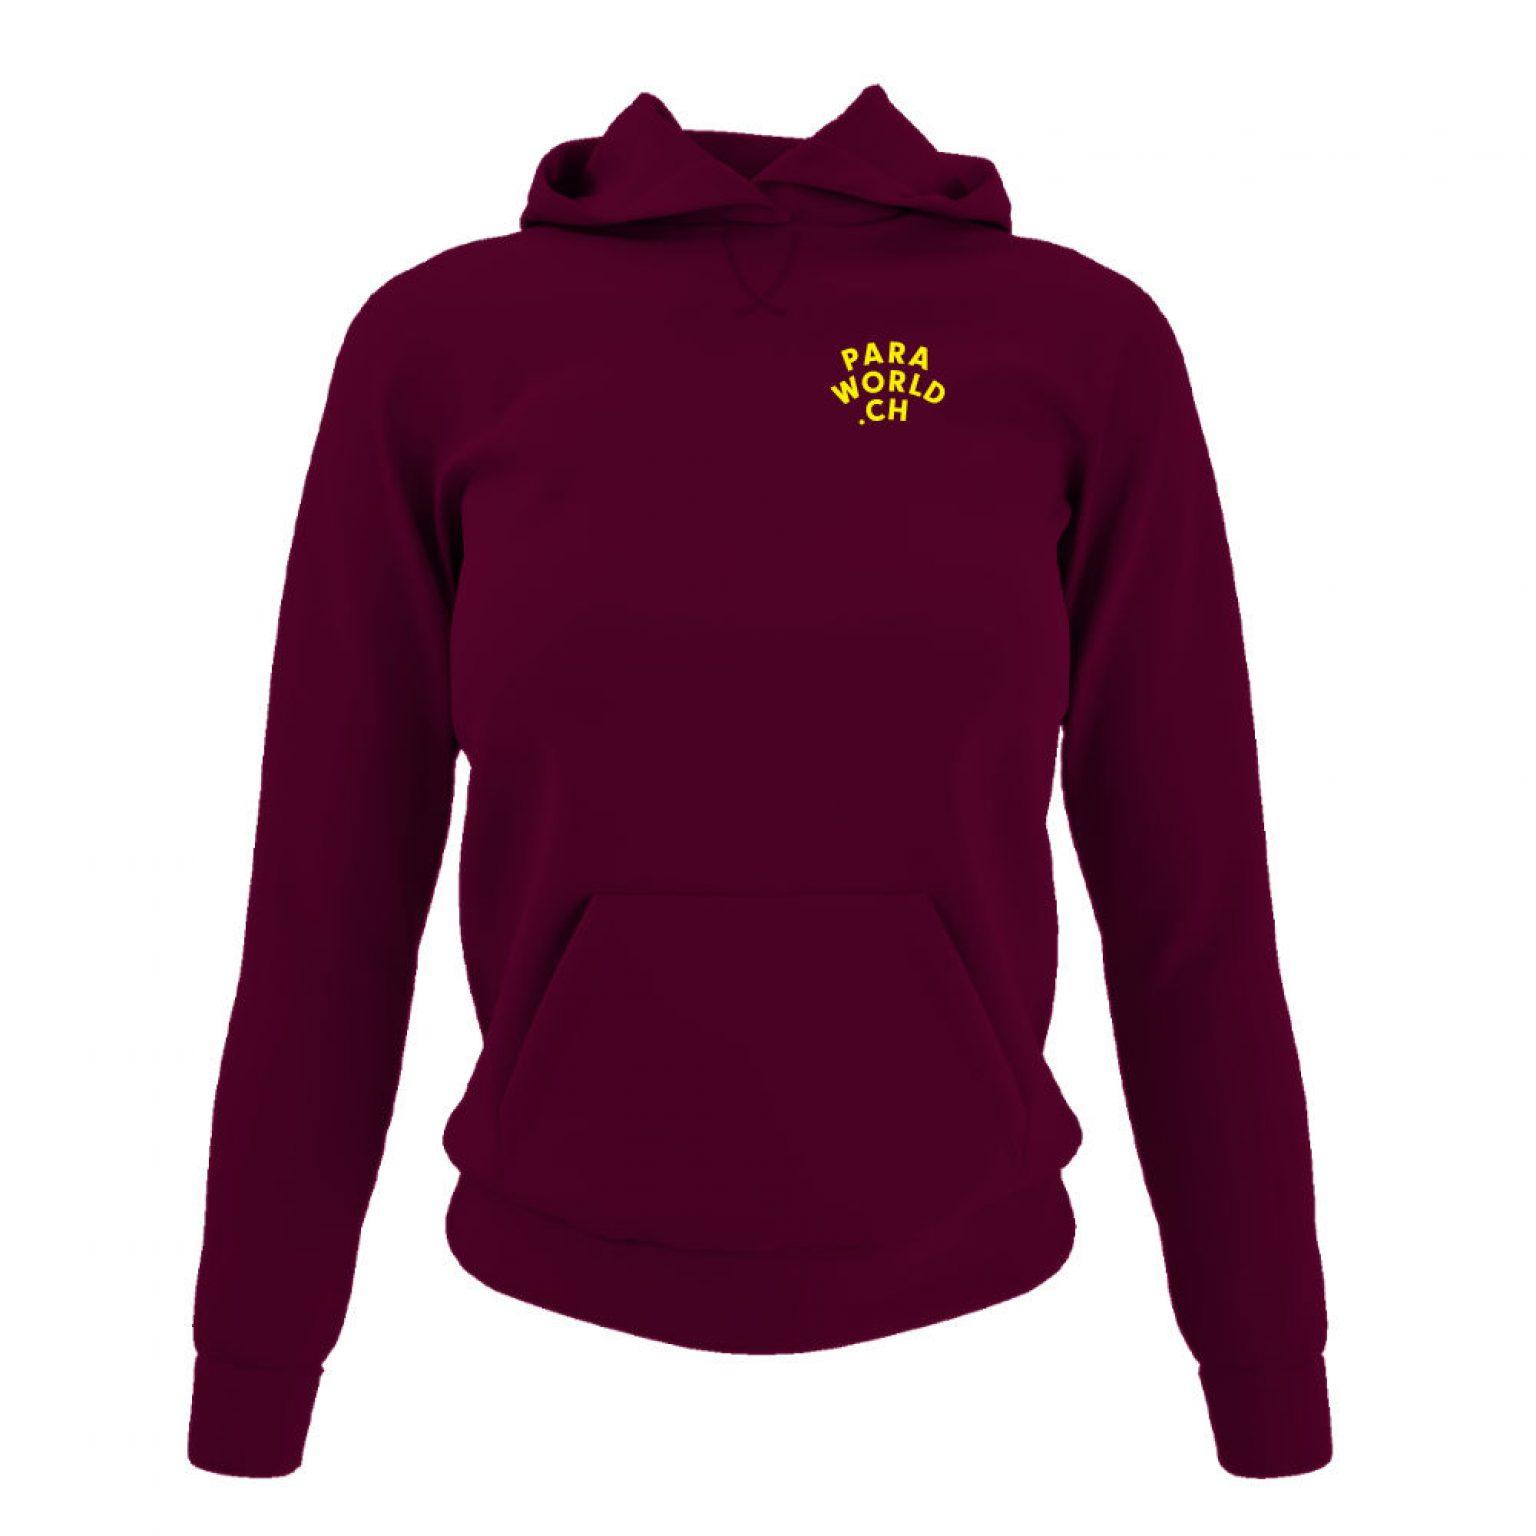 JTA b hoodie damen burgundy front-1